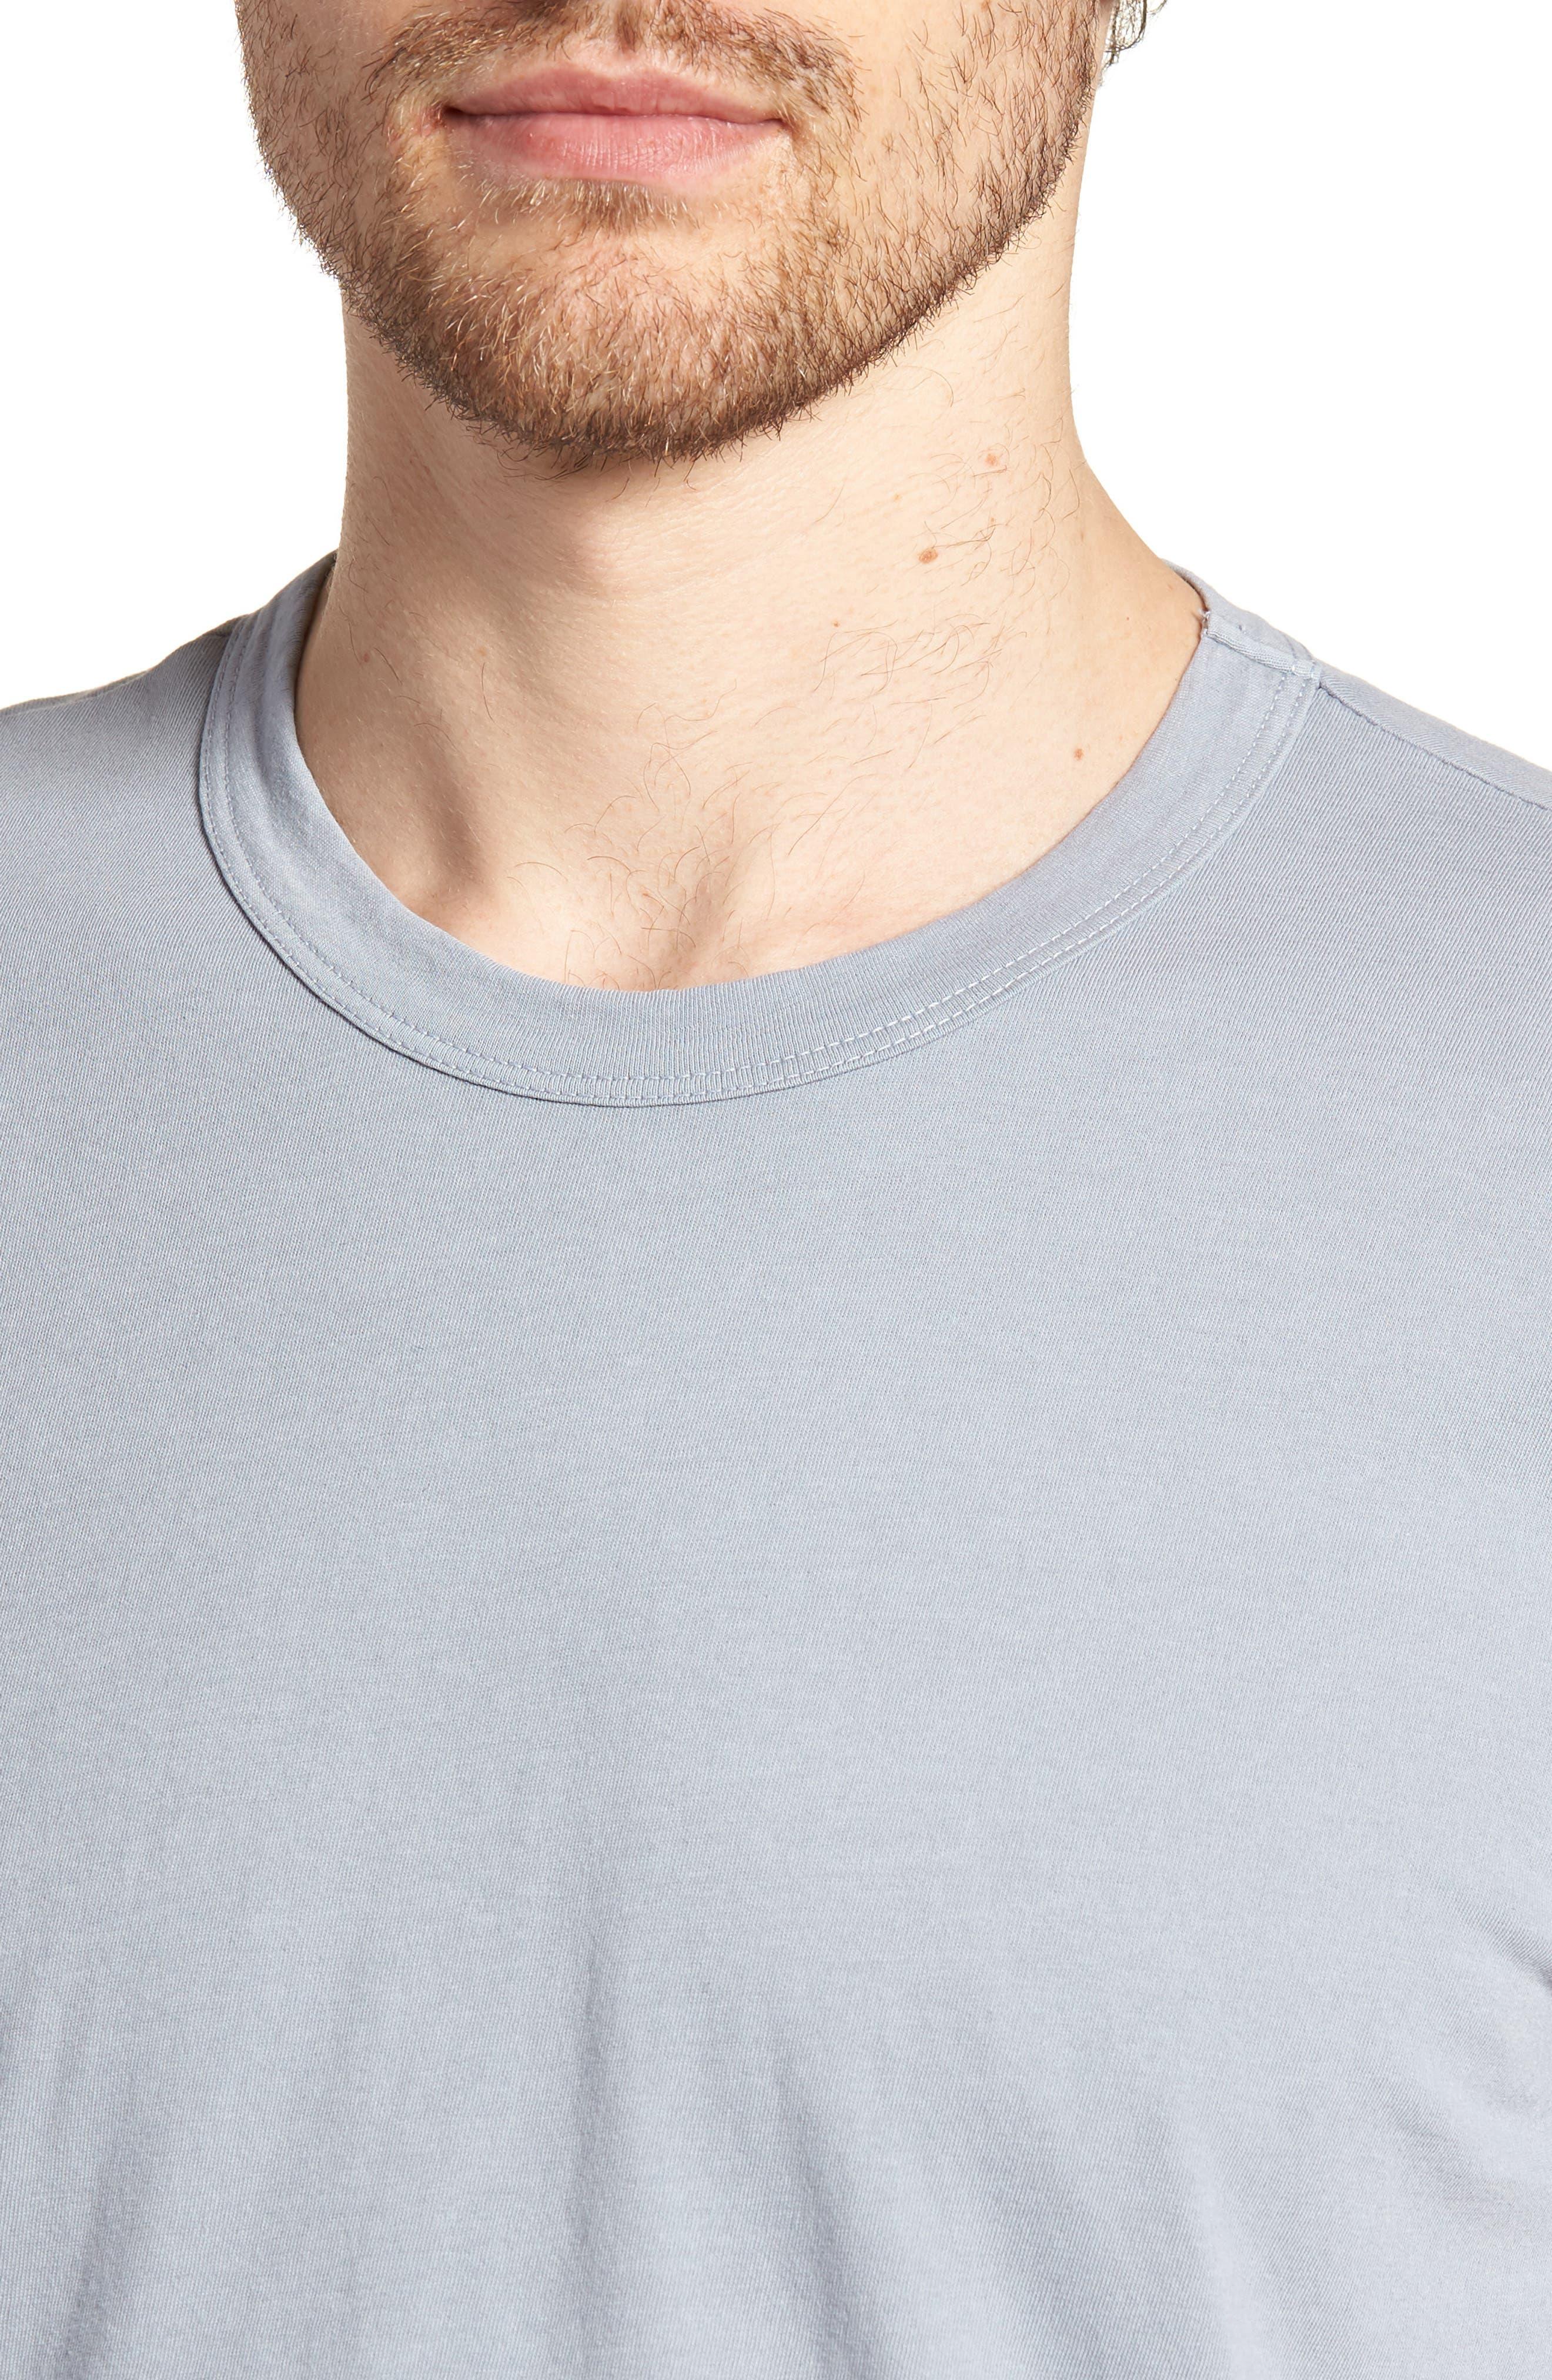 Checkerboard Crewneck T-Shirt,                             Alternate thumbnail 4, color,                             Grey Sky Pigment